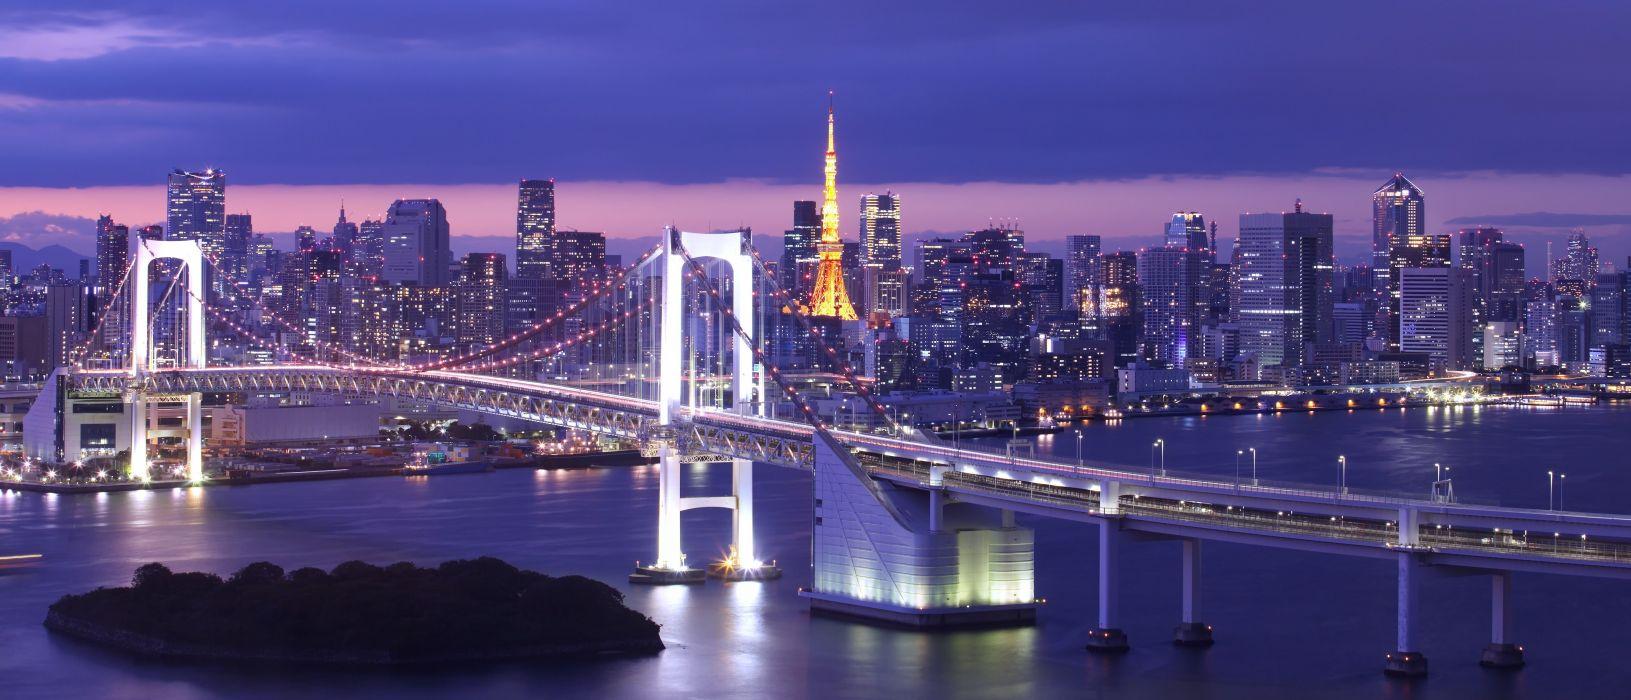 Bridges Japan Tokyo Tokyo Bay Rainbow Bridge Cities wallpaper